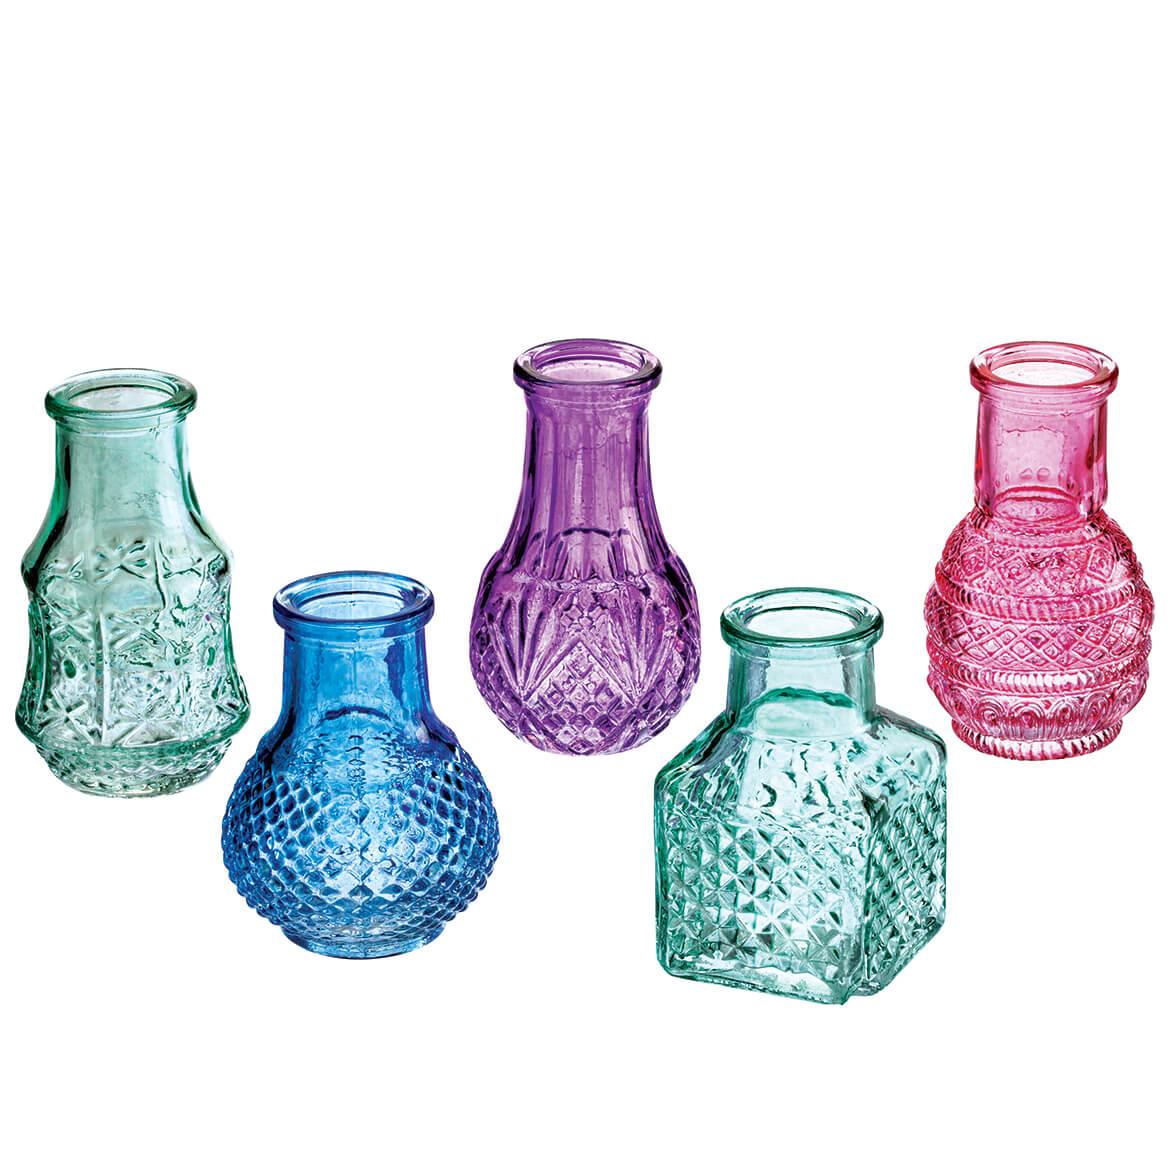 Mini Colored Glass Vases, Set of 5-370628